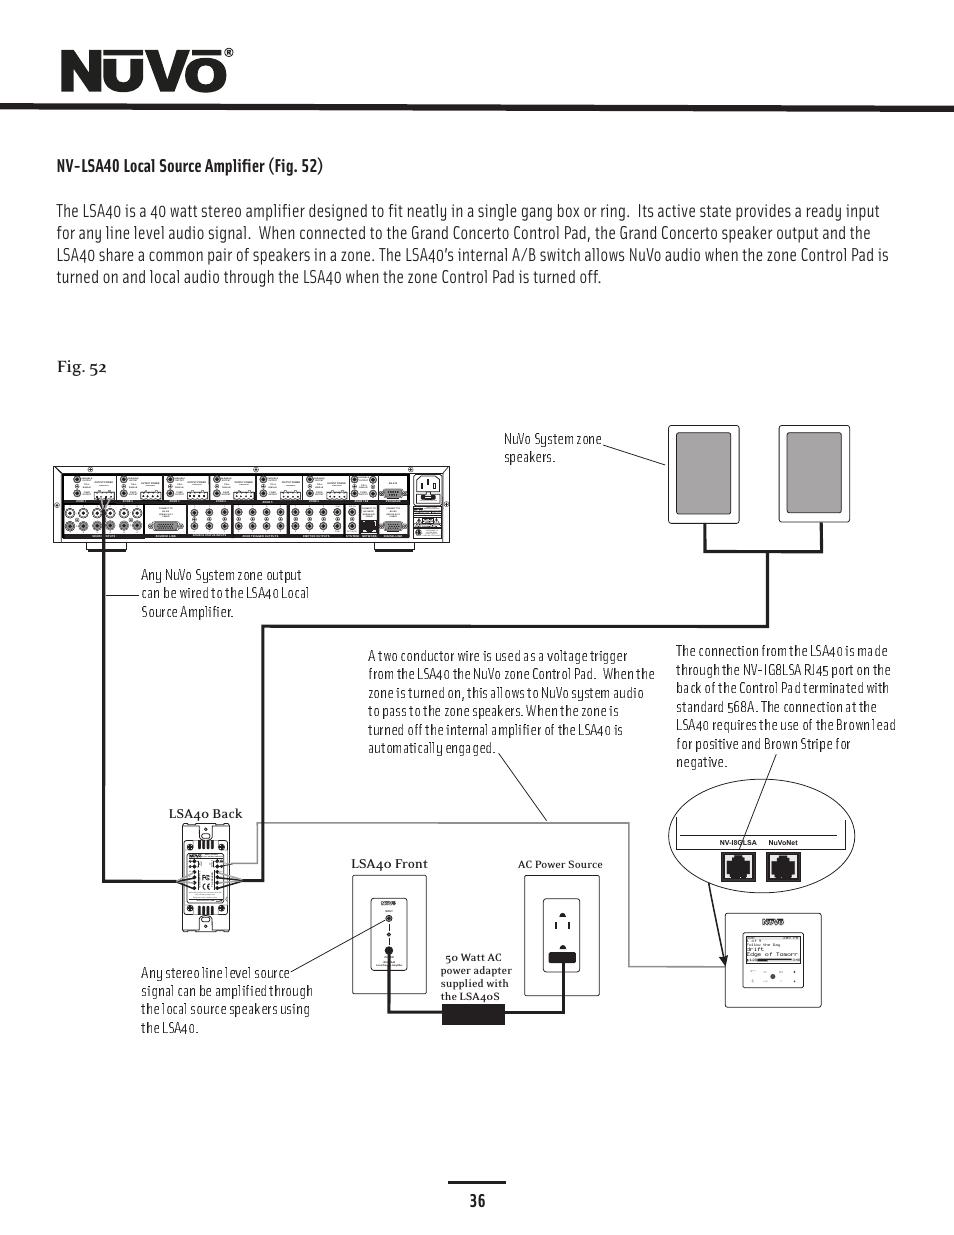 medium resolution of 36 fig 52 20w 6ohm x2 sum2 nuvo essentia nv e6gxs user manual52